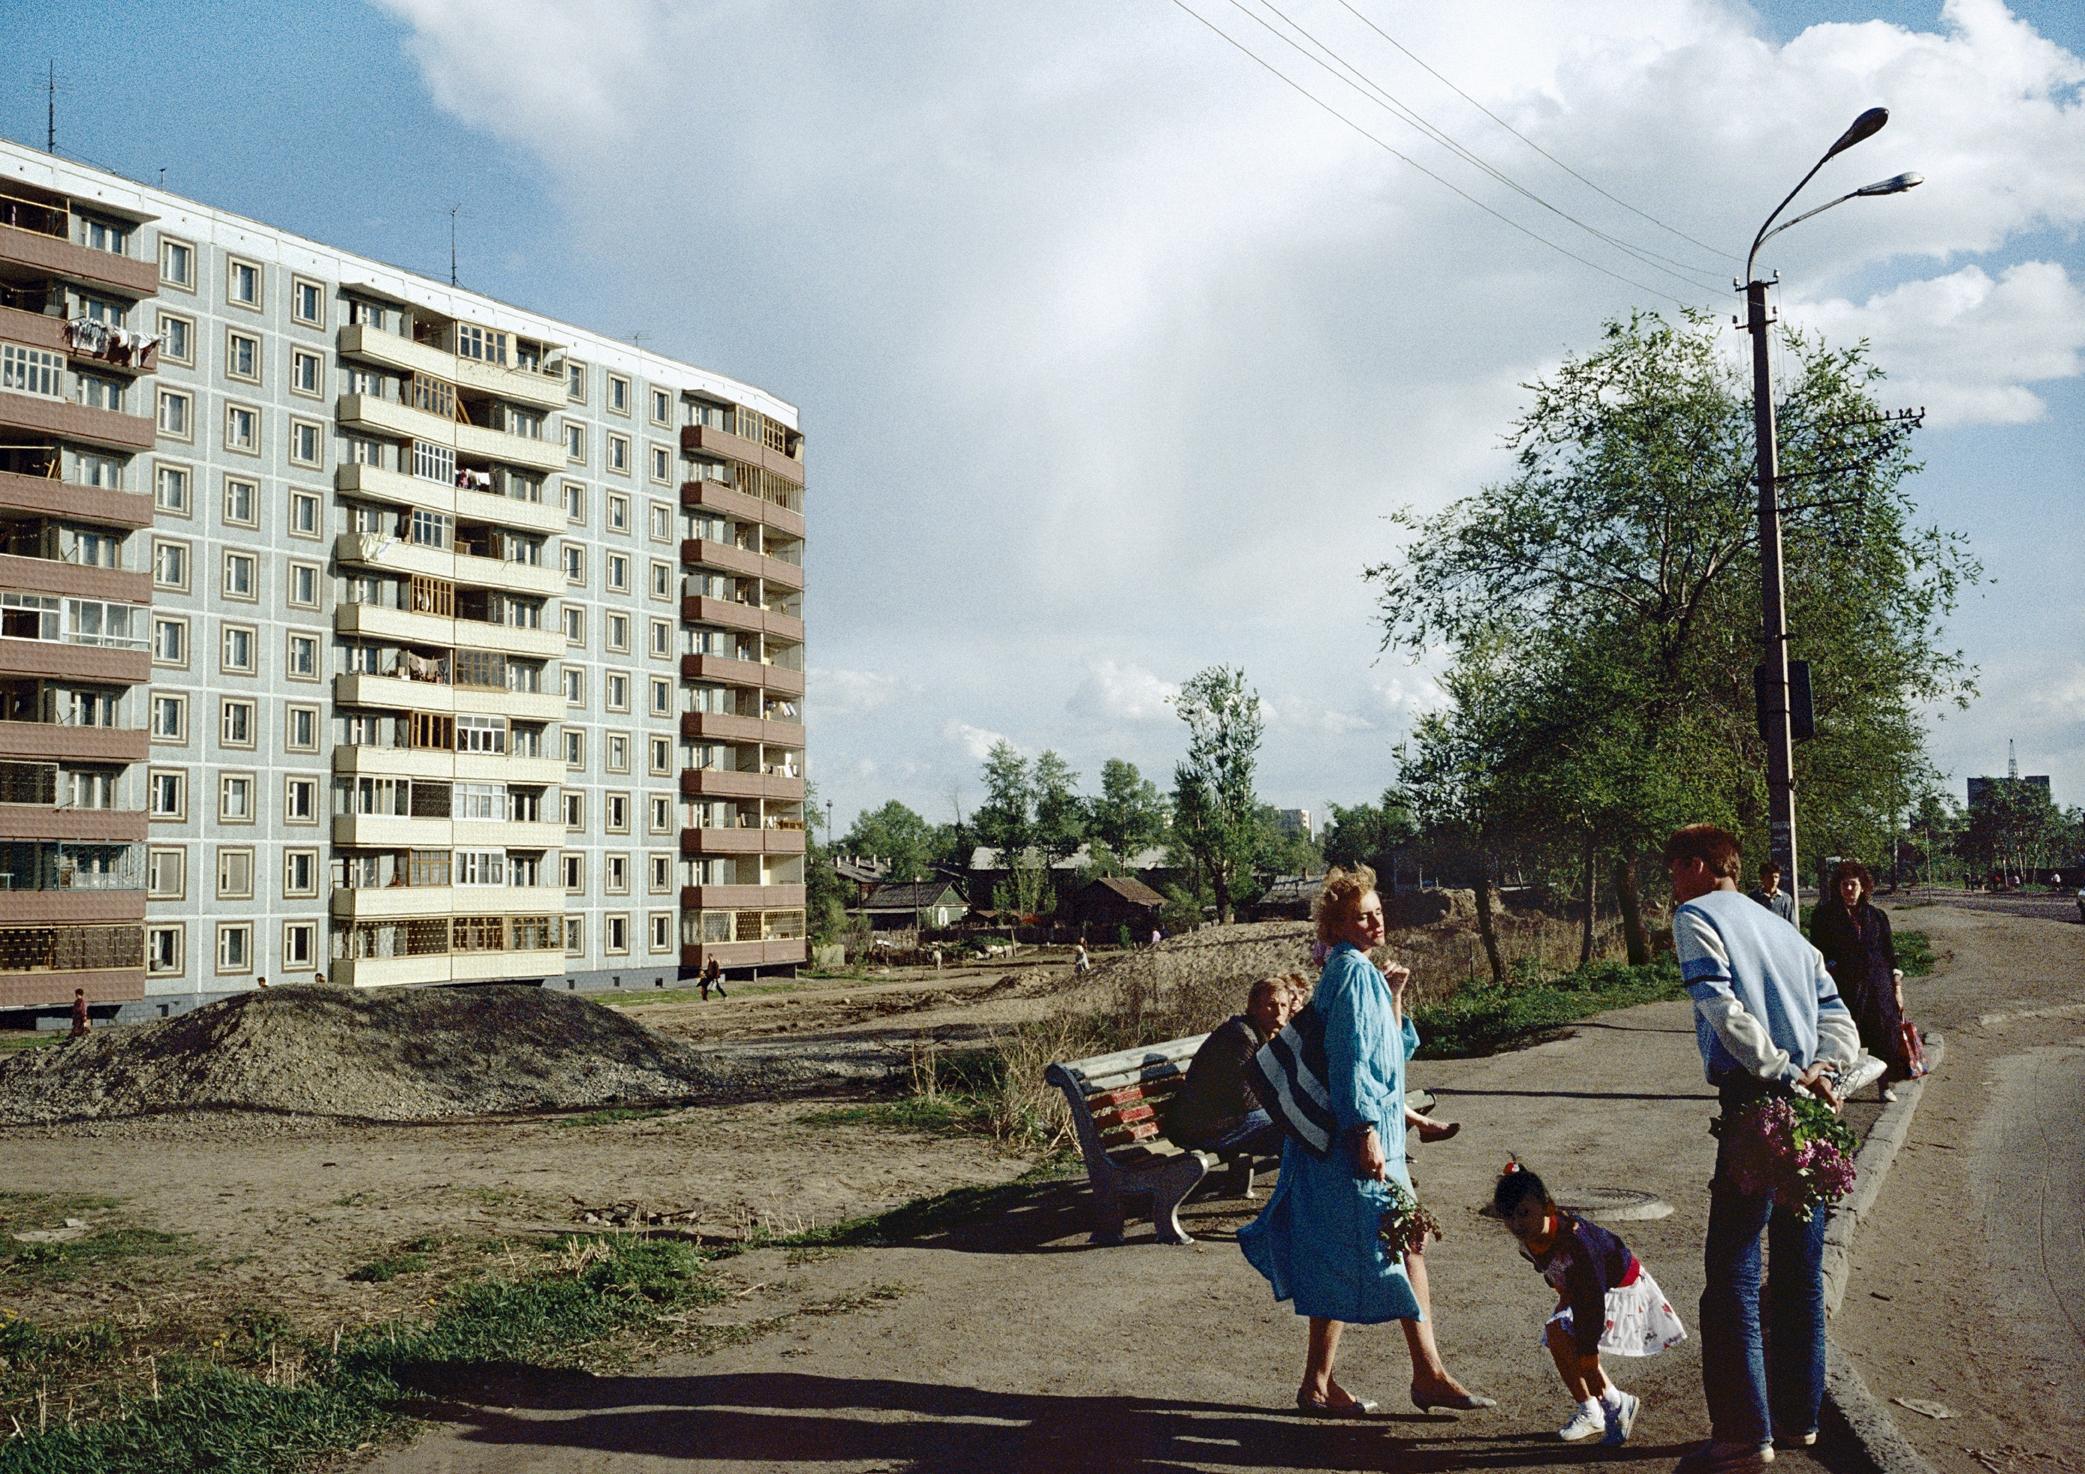 8/6/1991, Yuzhno-Sakhalnsk, Sakhalin, Russian SFSR: Yuzhno-Sakhalinsk suburbs